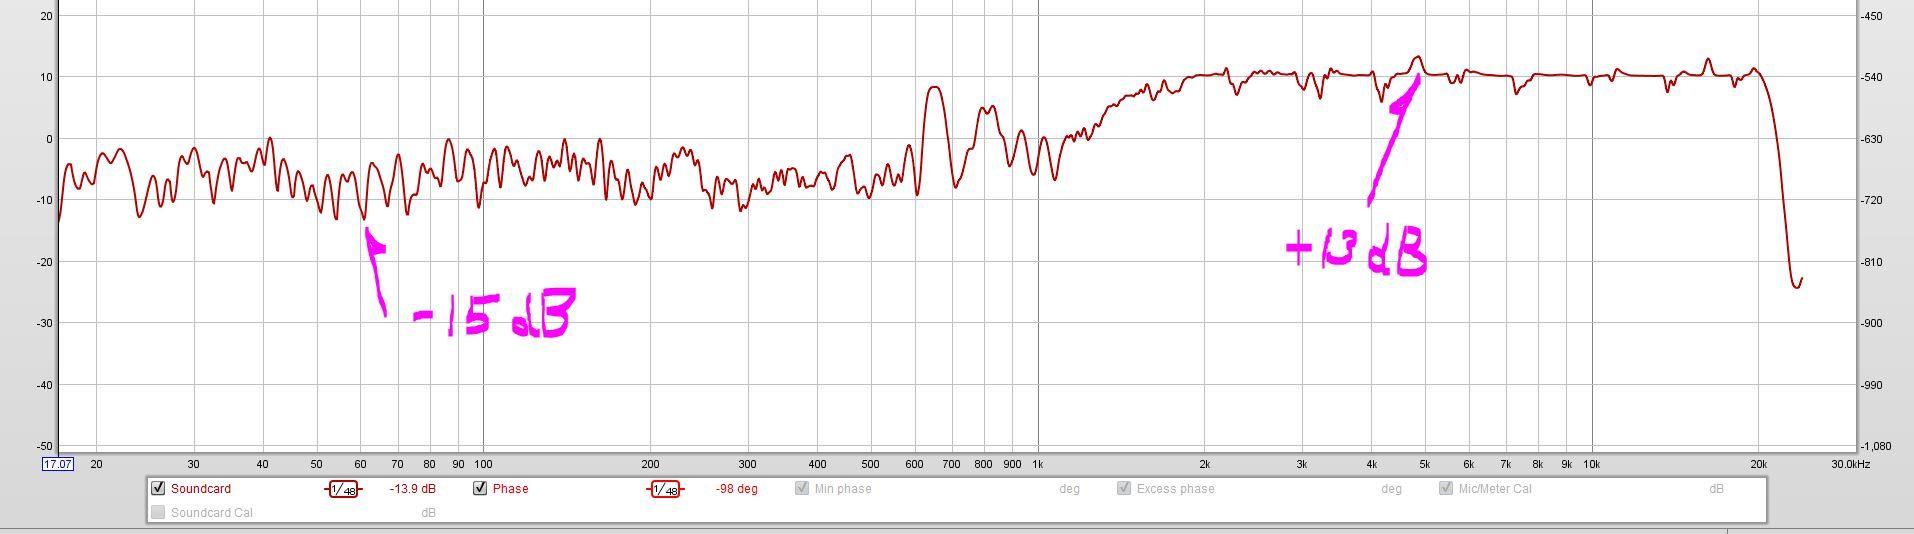 Audio interface response -15 to 13 dB.JPG